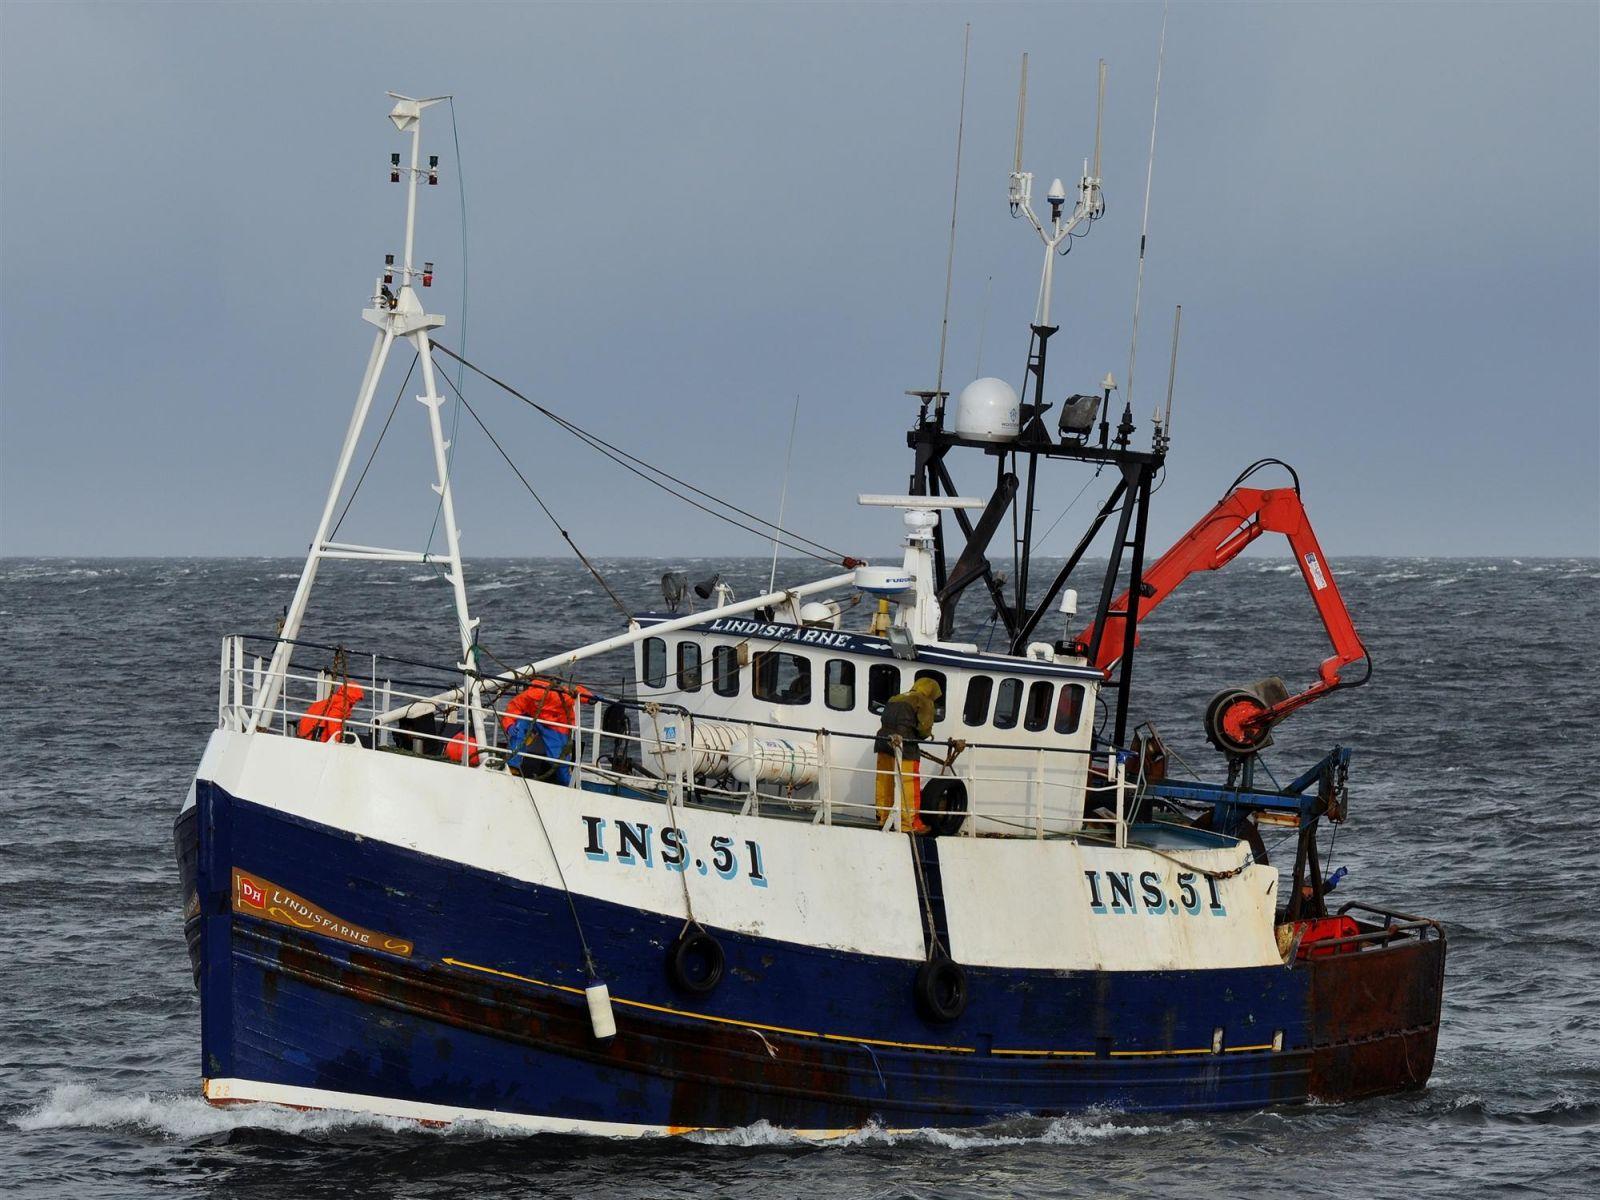 Lindisfarne  INS 51